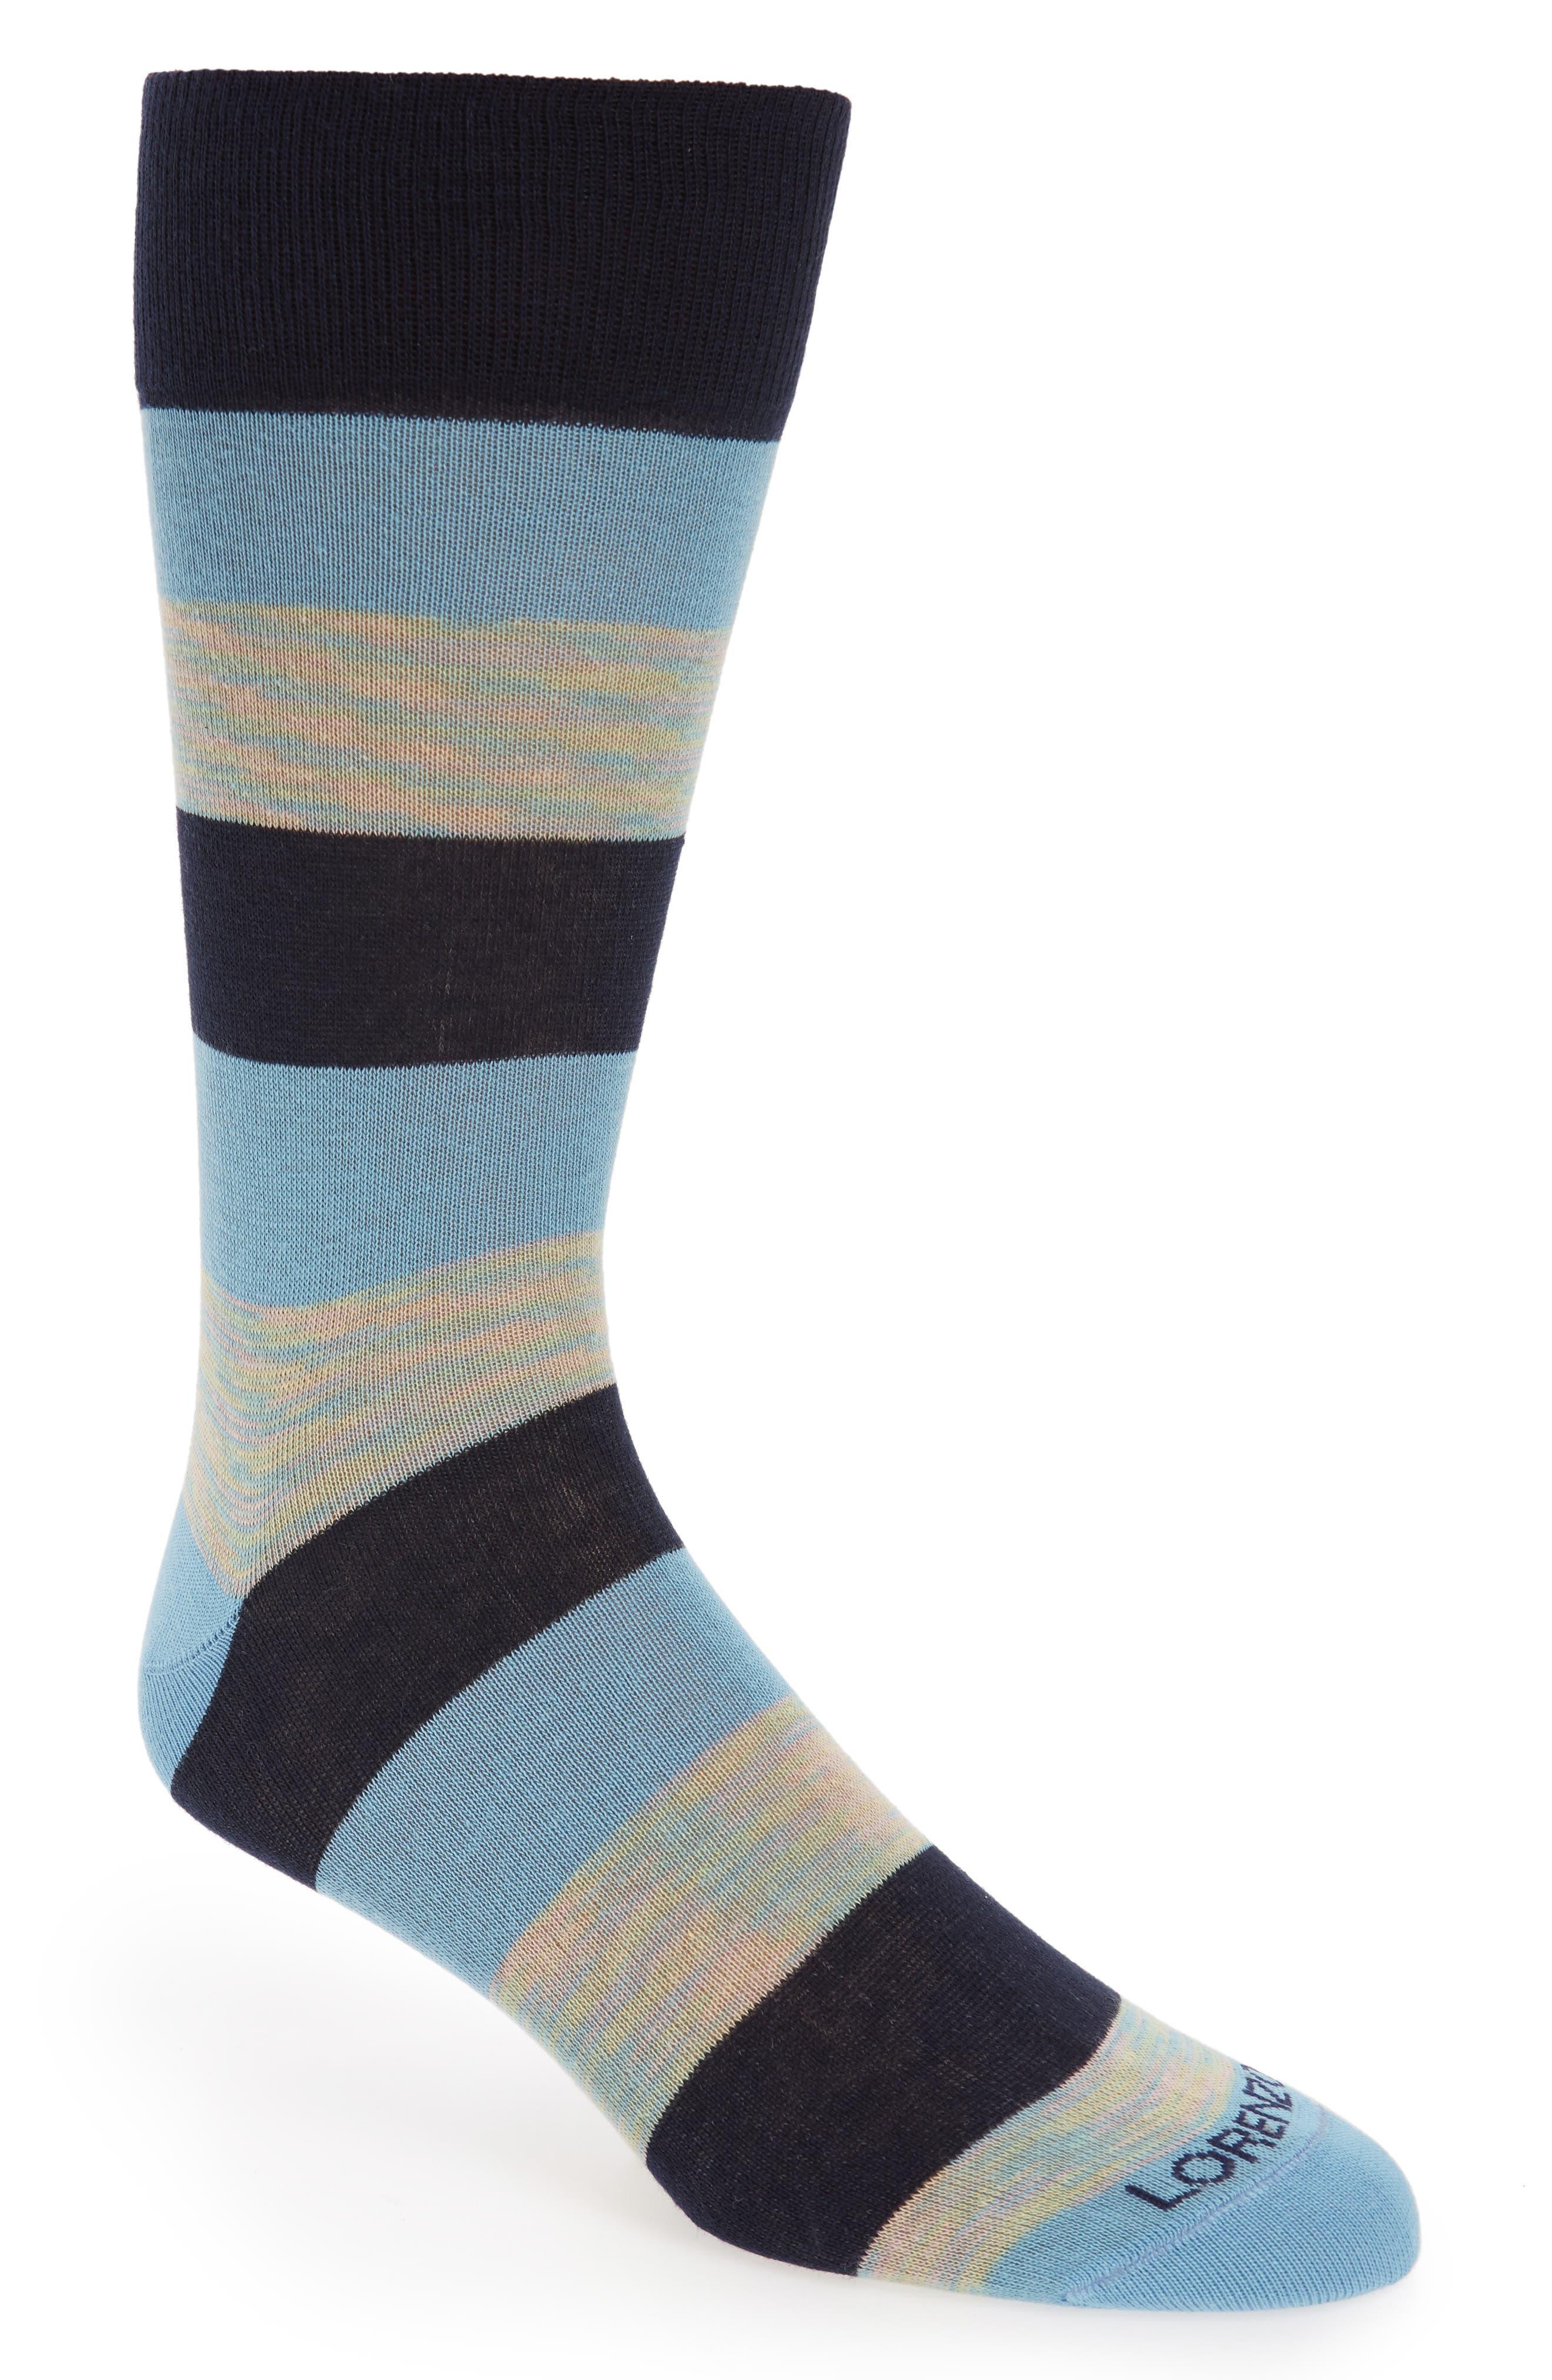 Rugby Stripe Socks,                             Main thumbnail 1, color,                             Light Blue